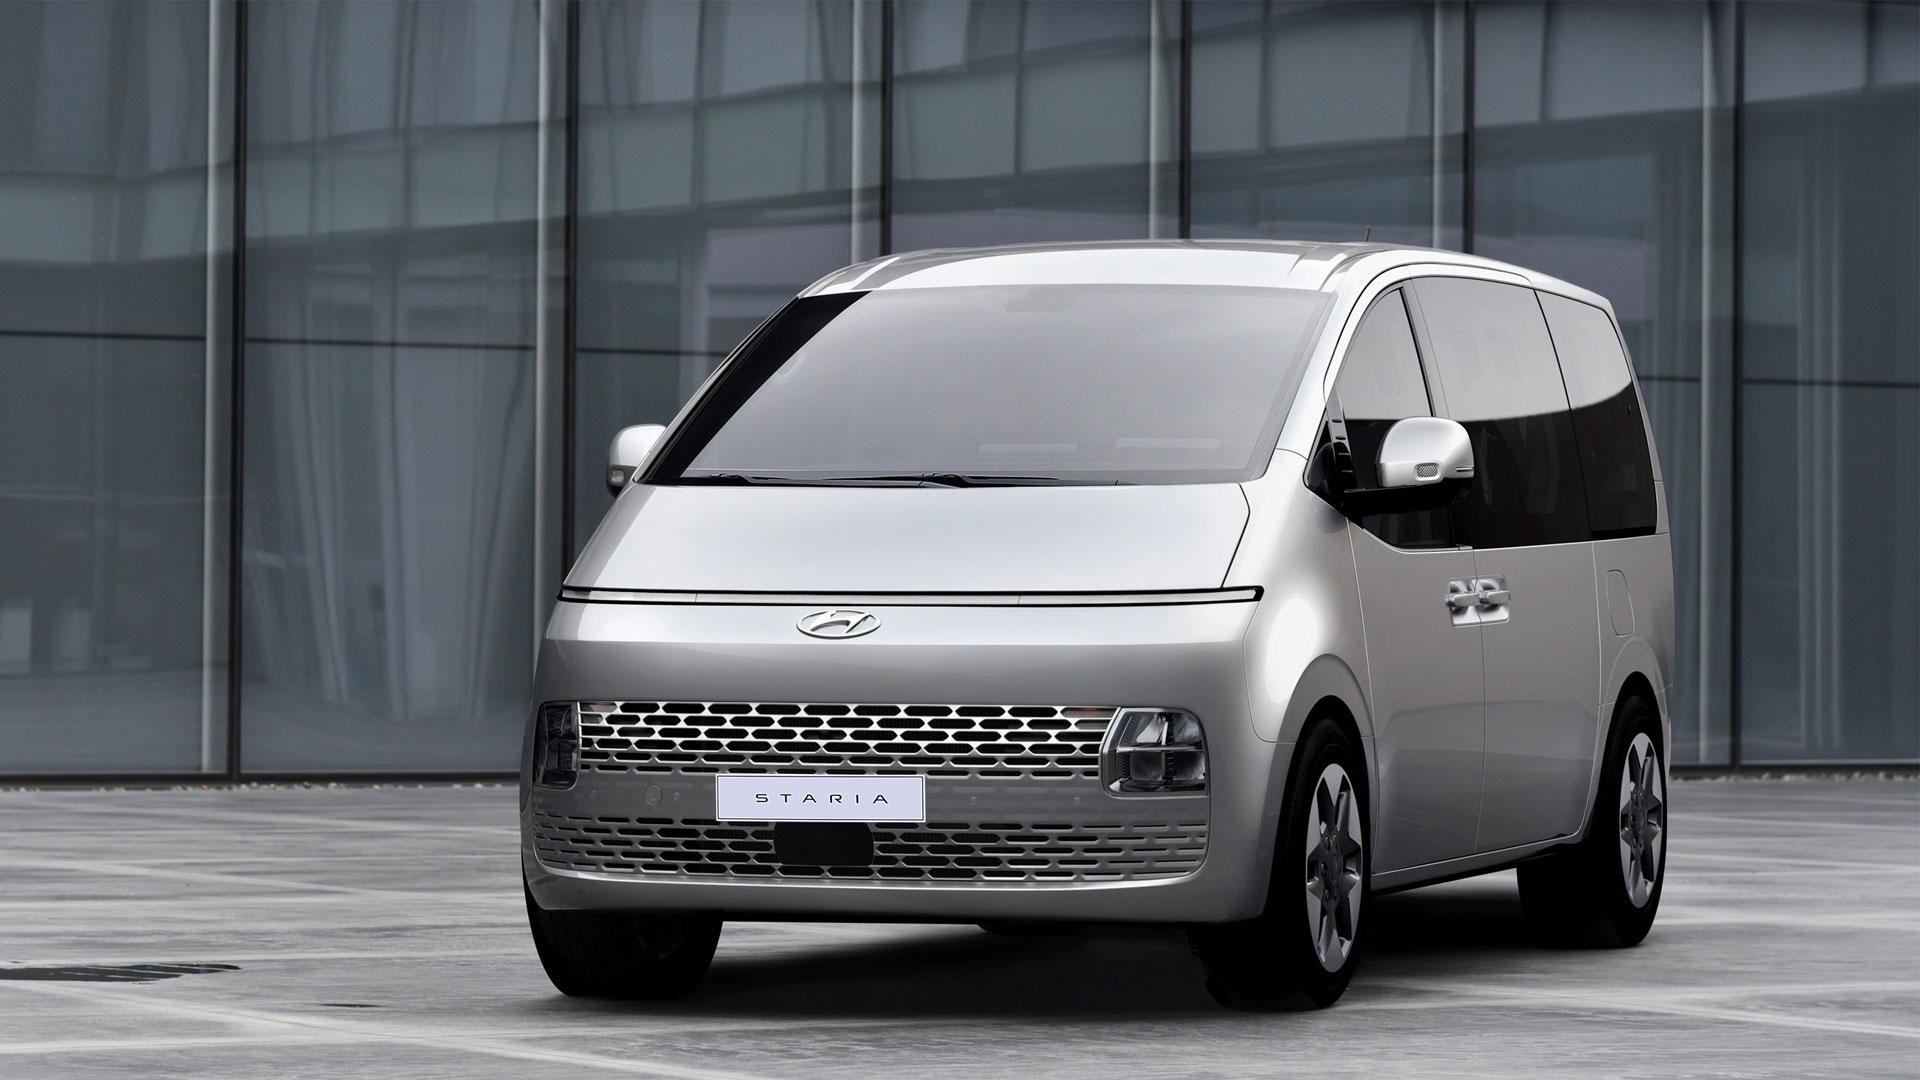 The Hyundai Staria front alternative angle